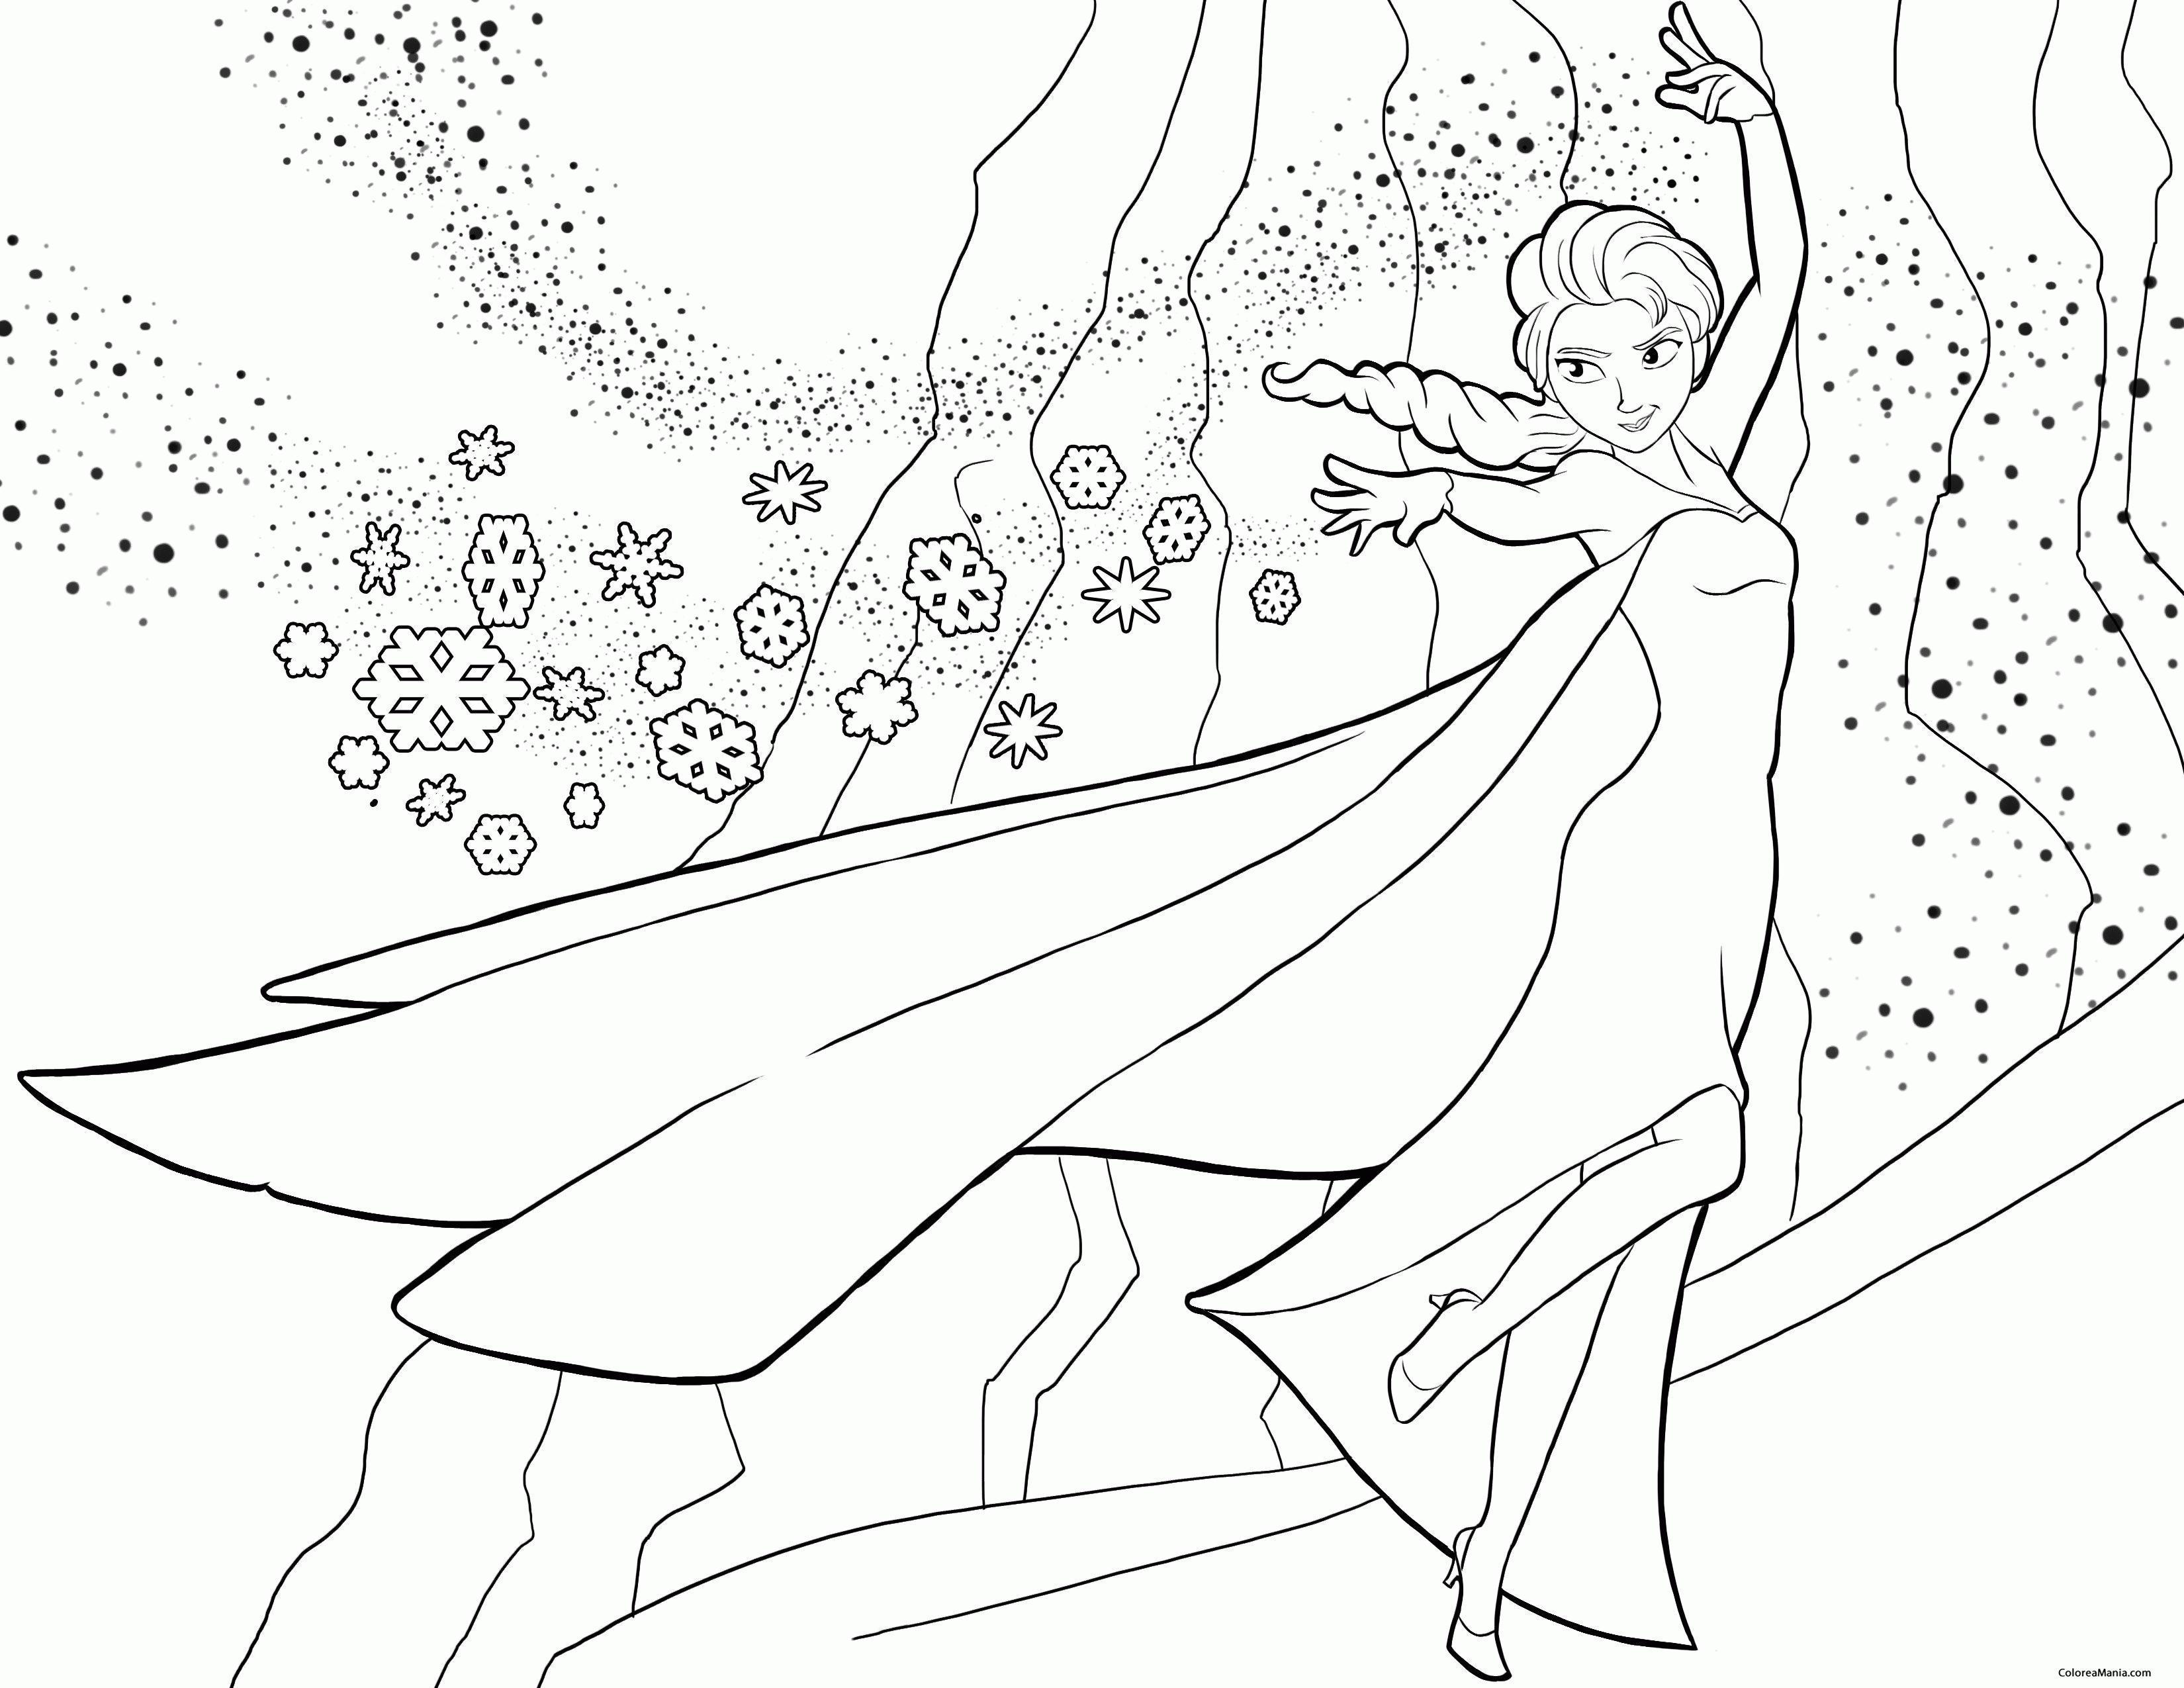 Colorear Elsa 3 Frozen Dibujo Para Colorear Gratis